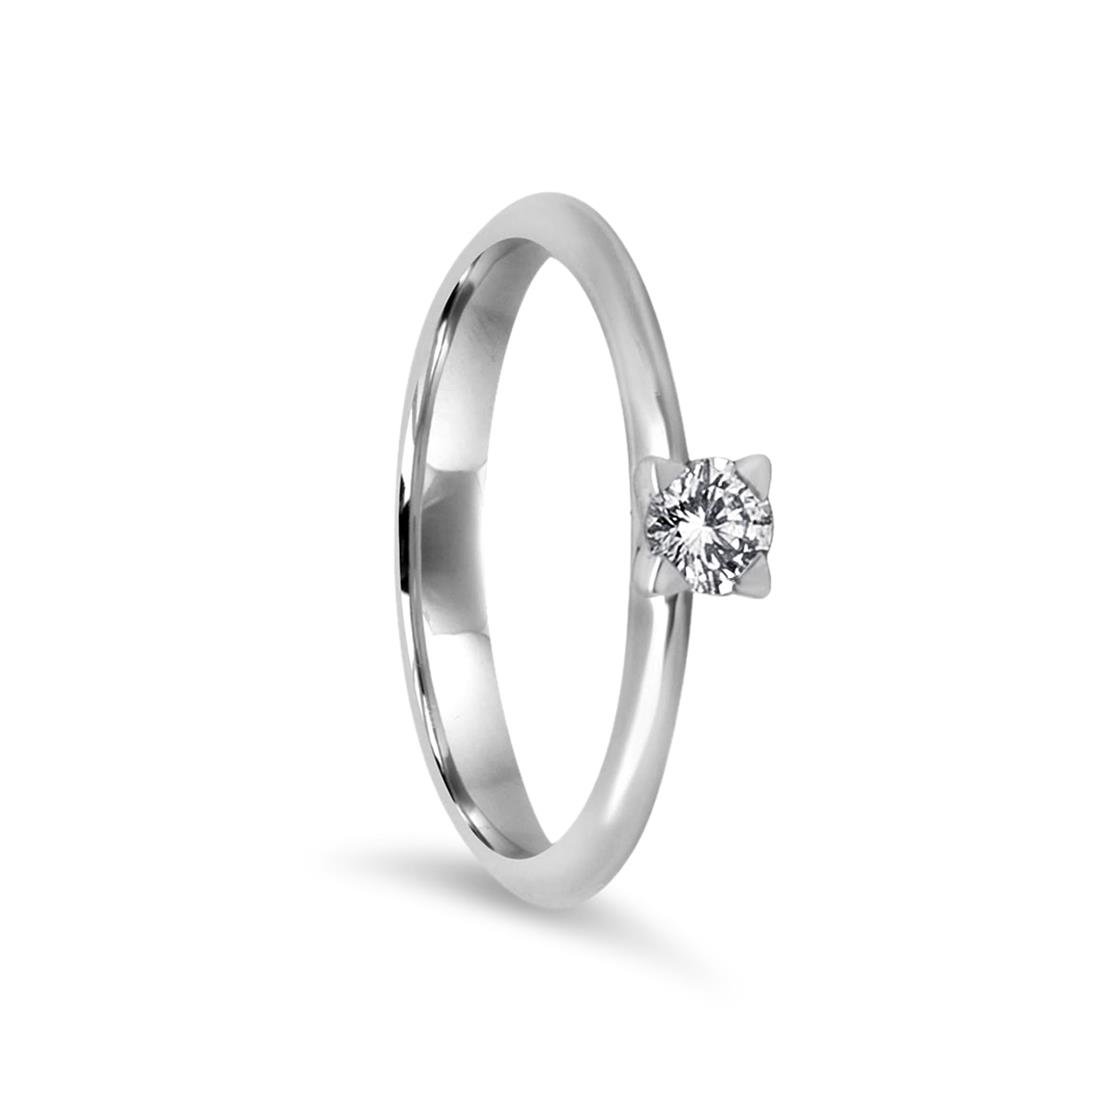 Solitaire ring with diamond - ALFIERI & ST. JOHN